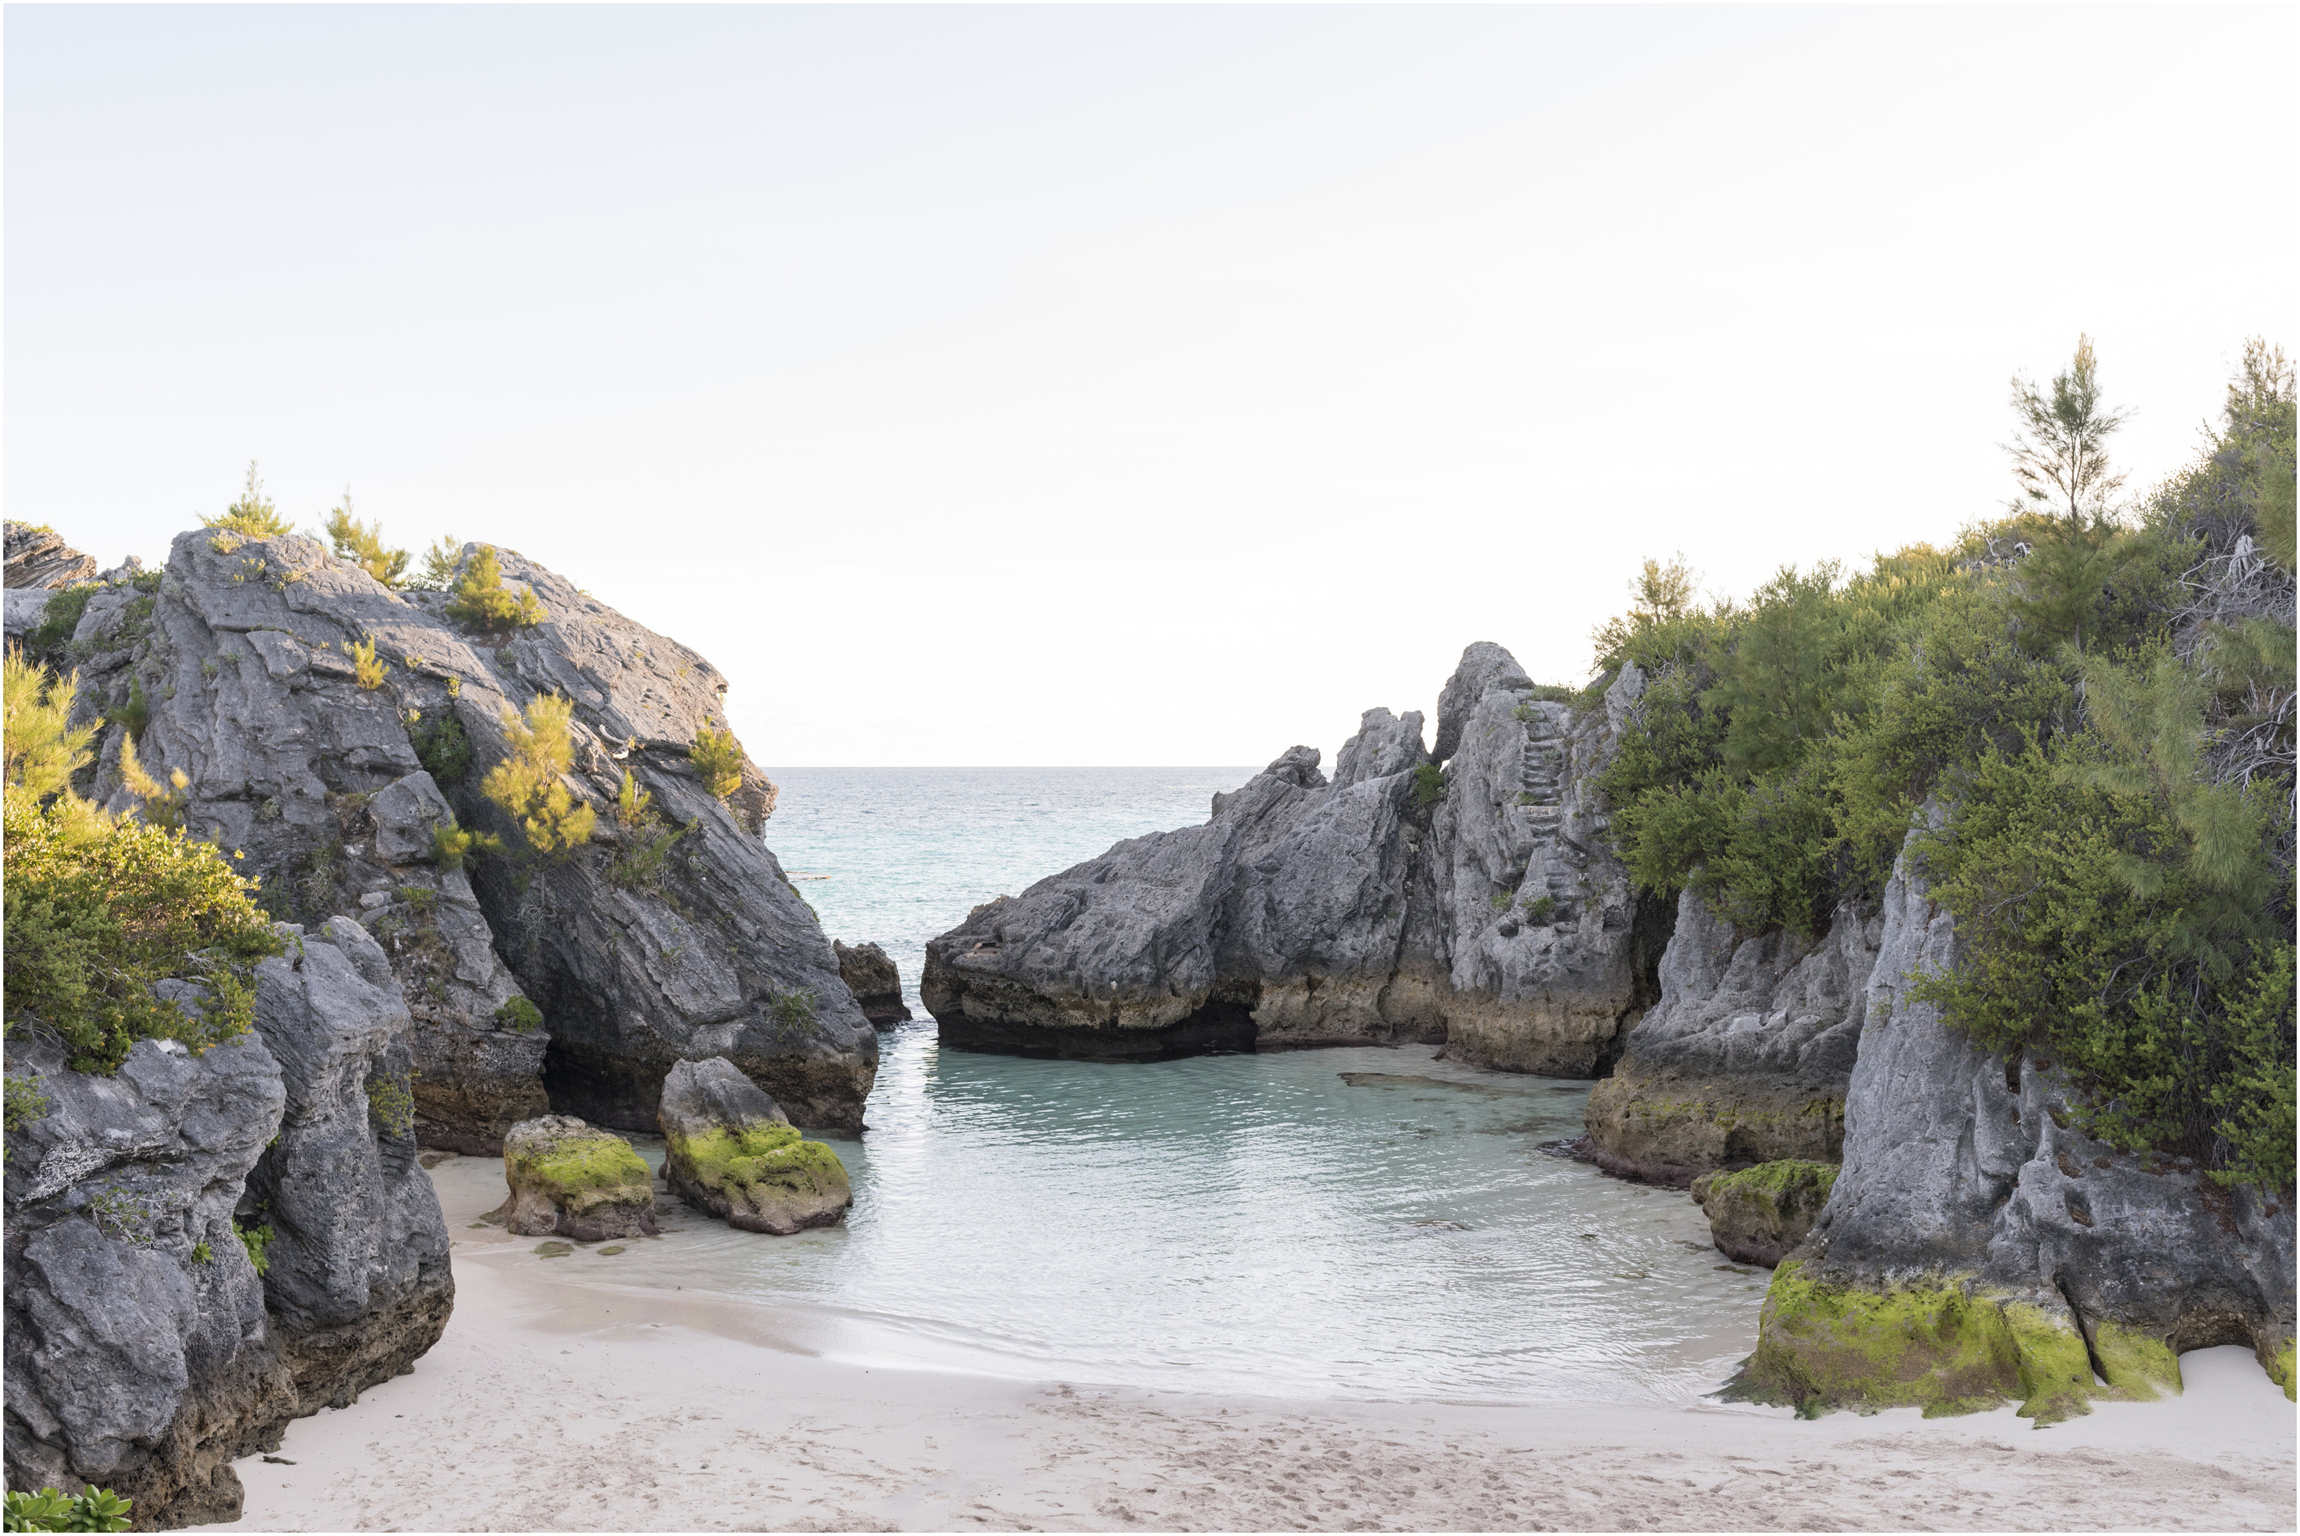 ©FianderFoto_Photo Tour_Beach_003.jpg